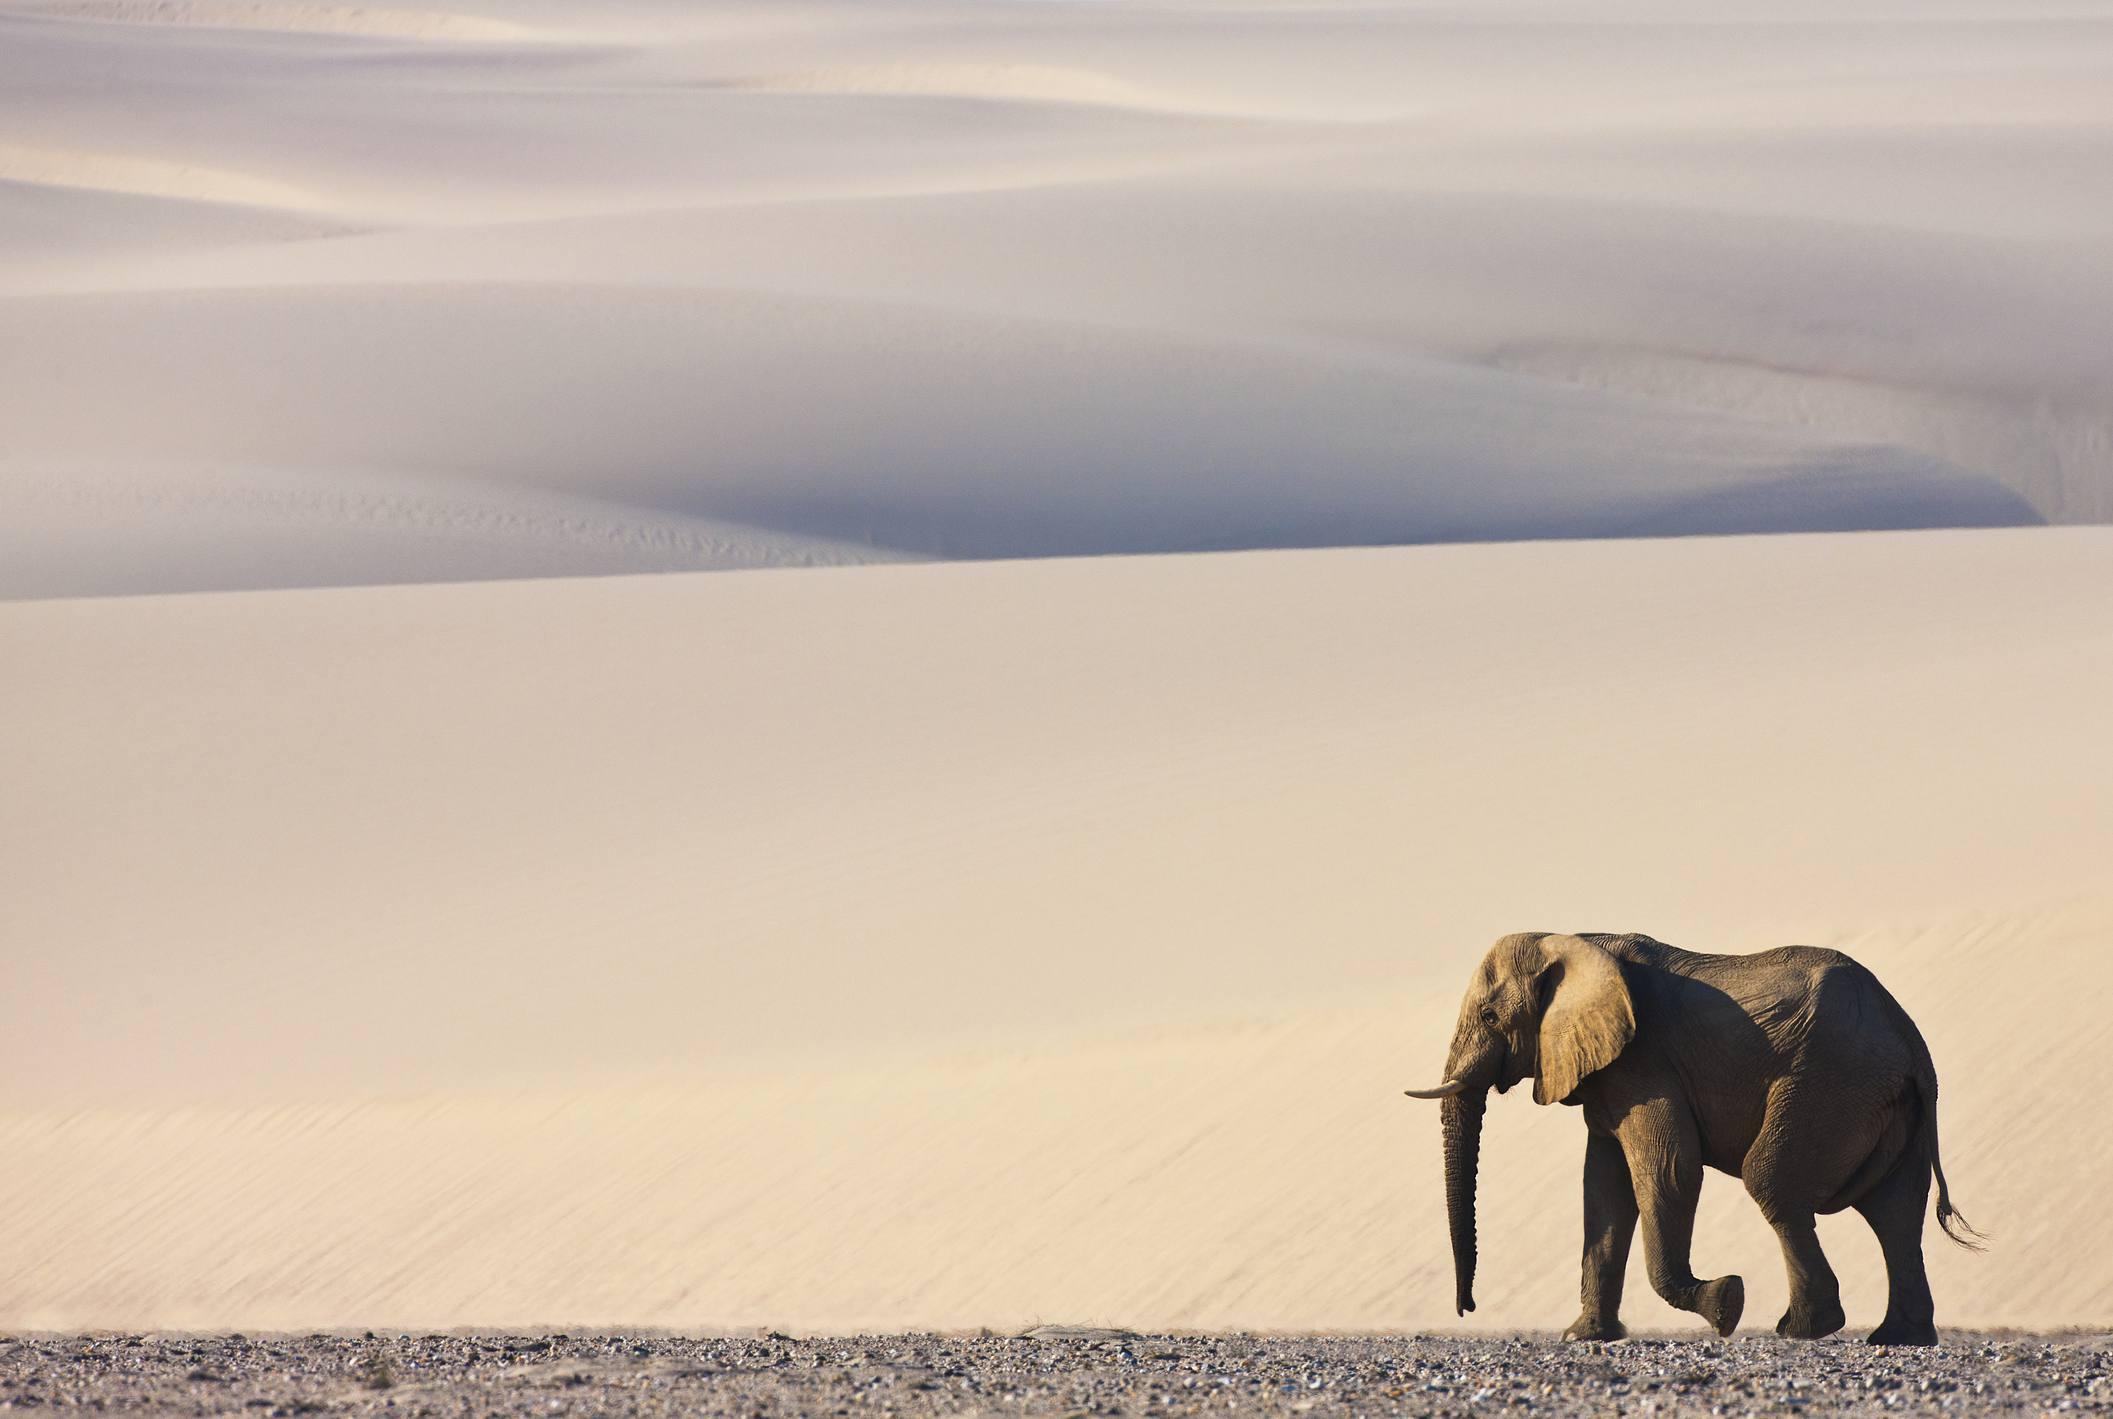 Desert-Adapted Elephant